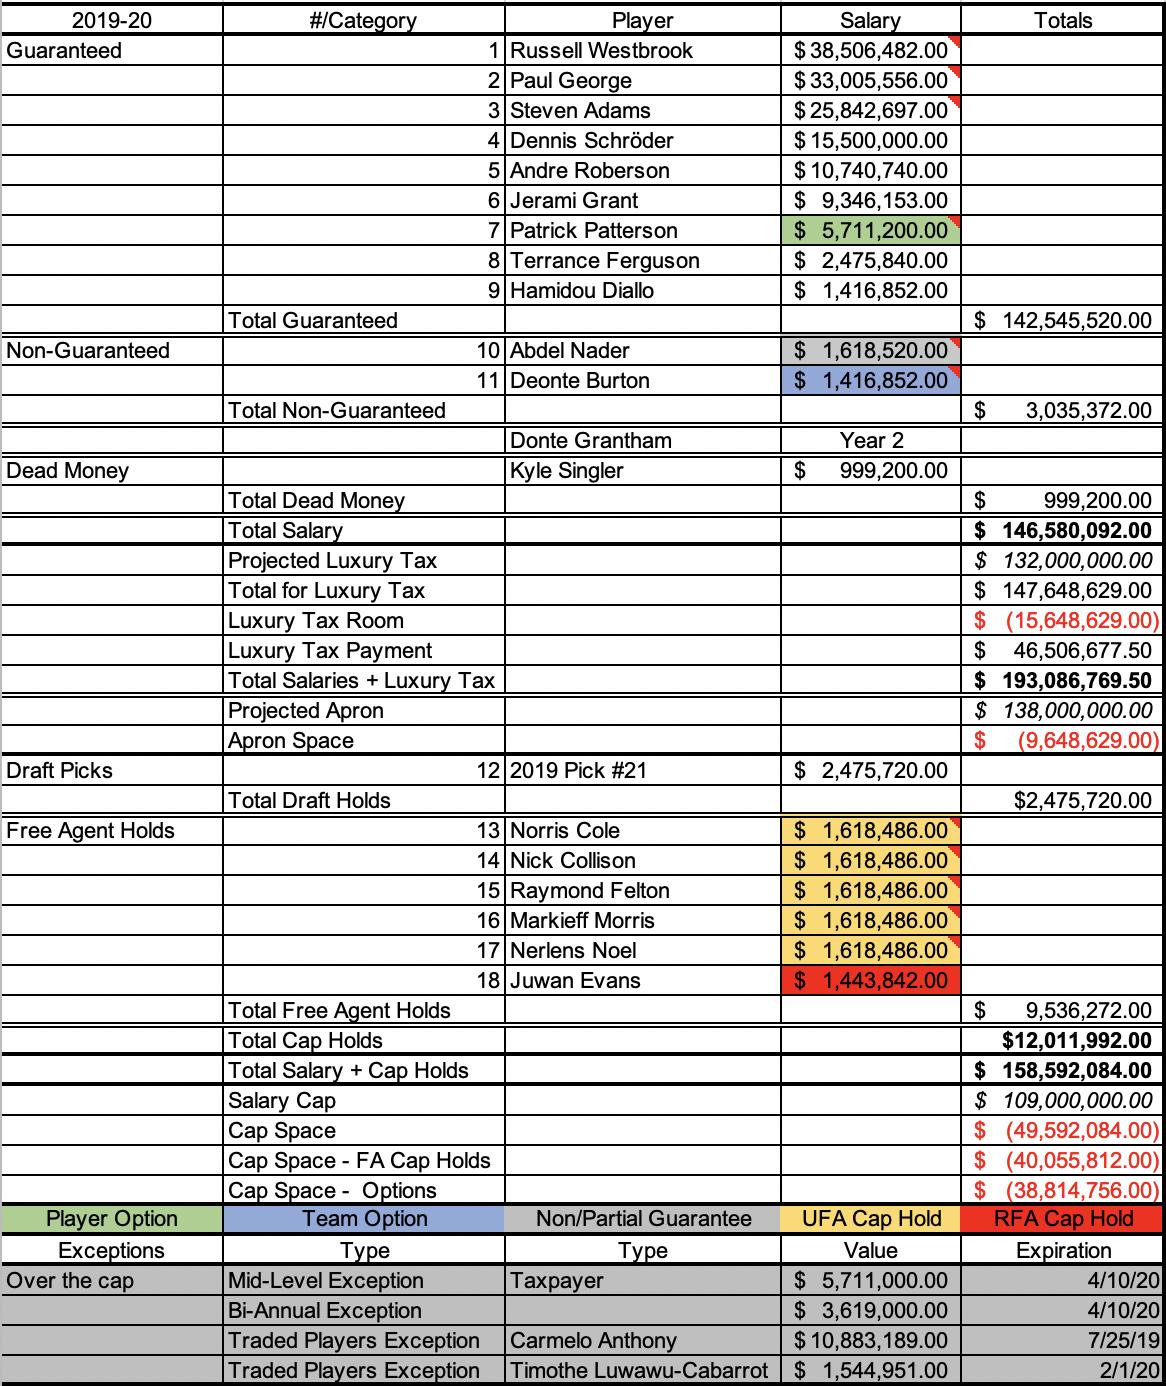 Thunder payroll pre-2019 draft